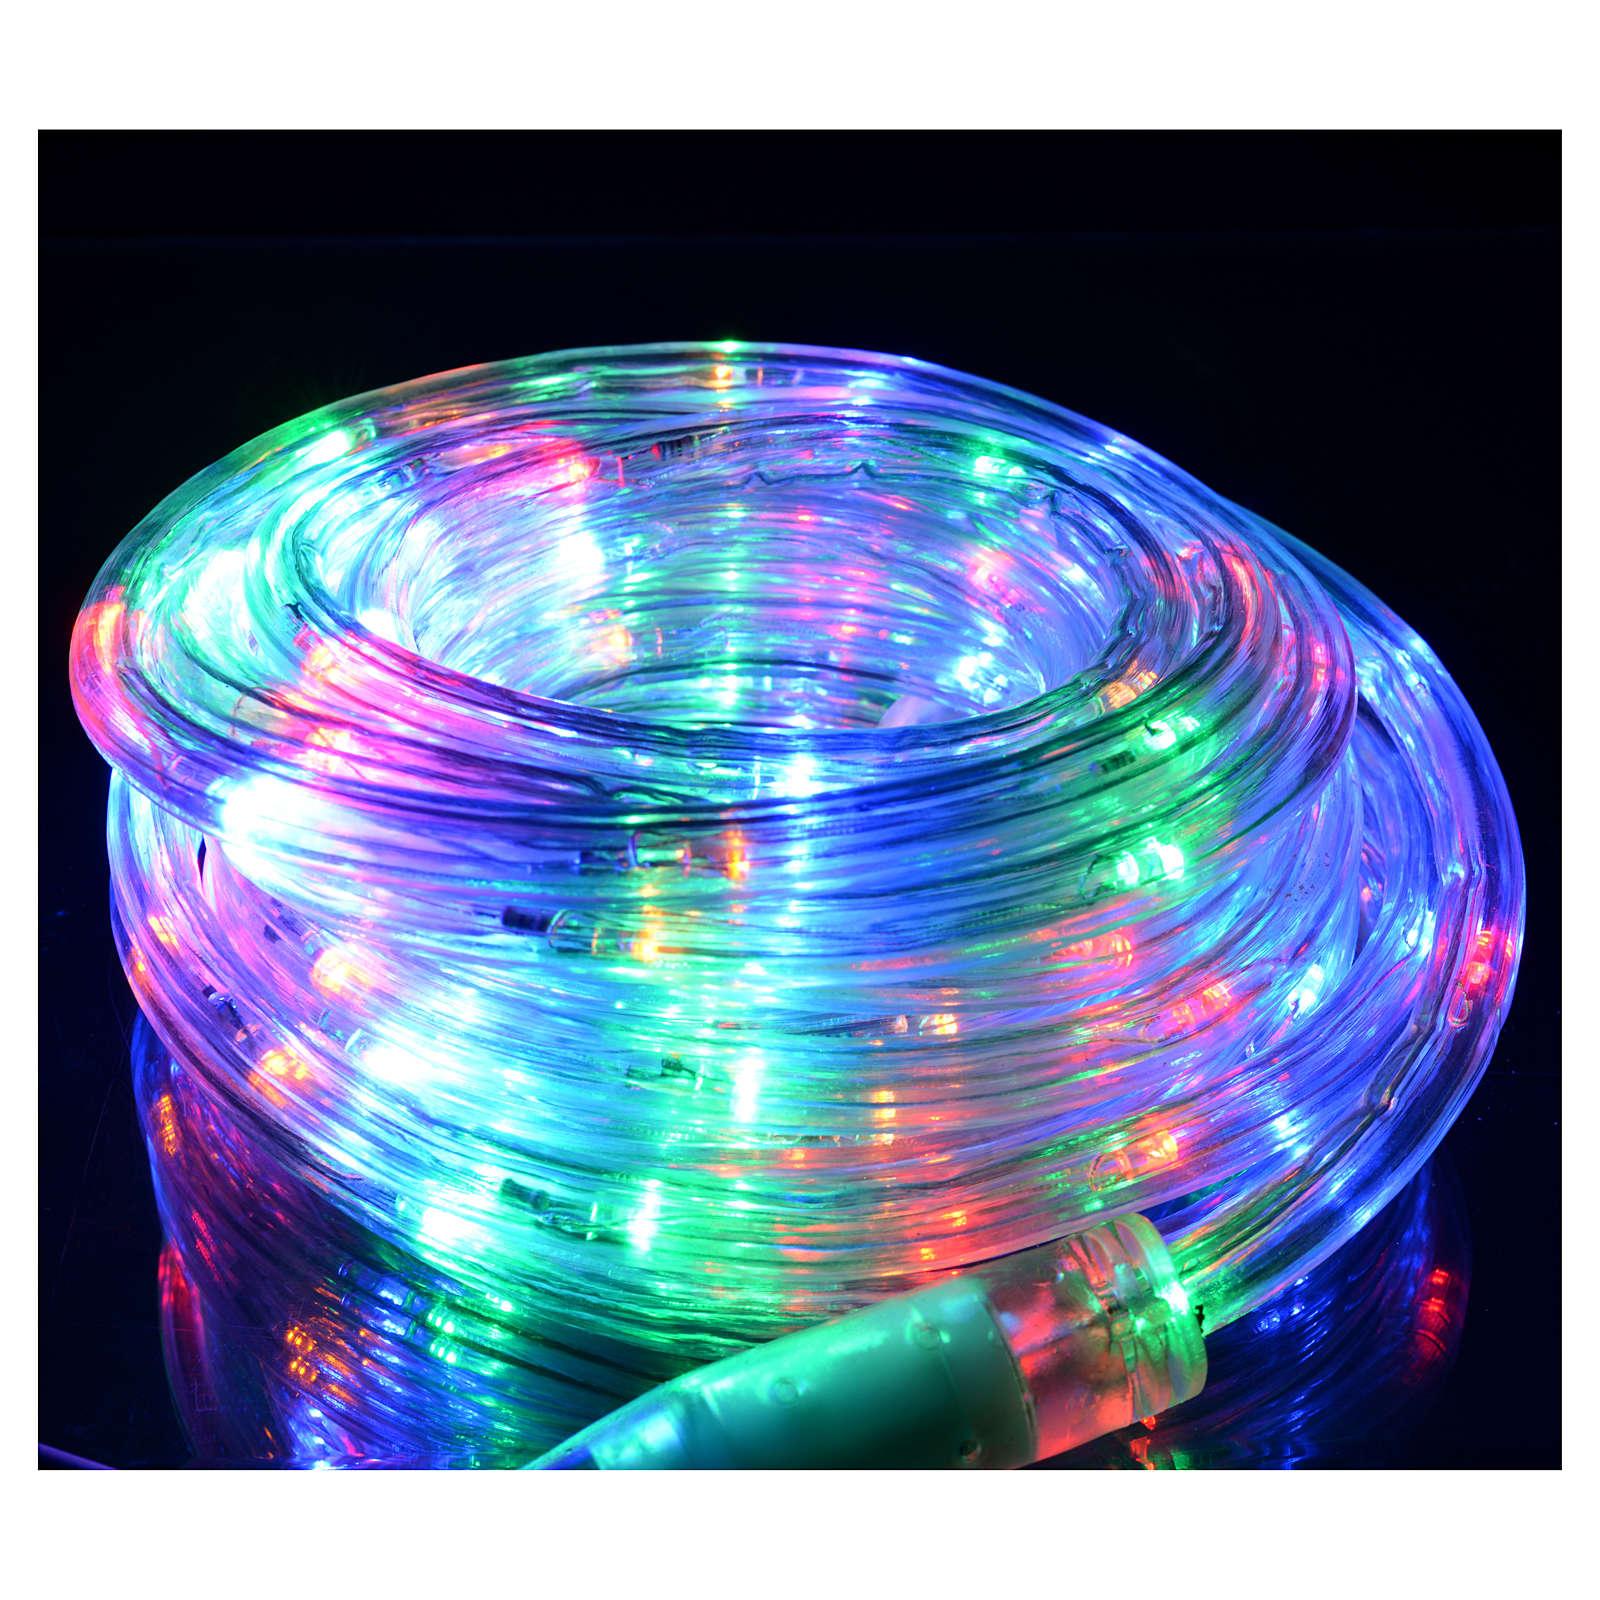 Luce di Natale tubo led 6mt programmabile int est 3